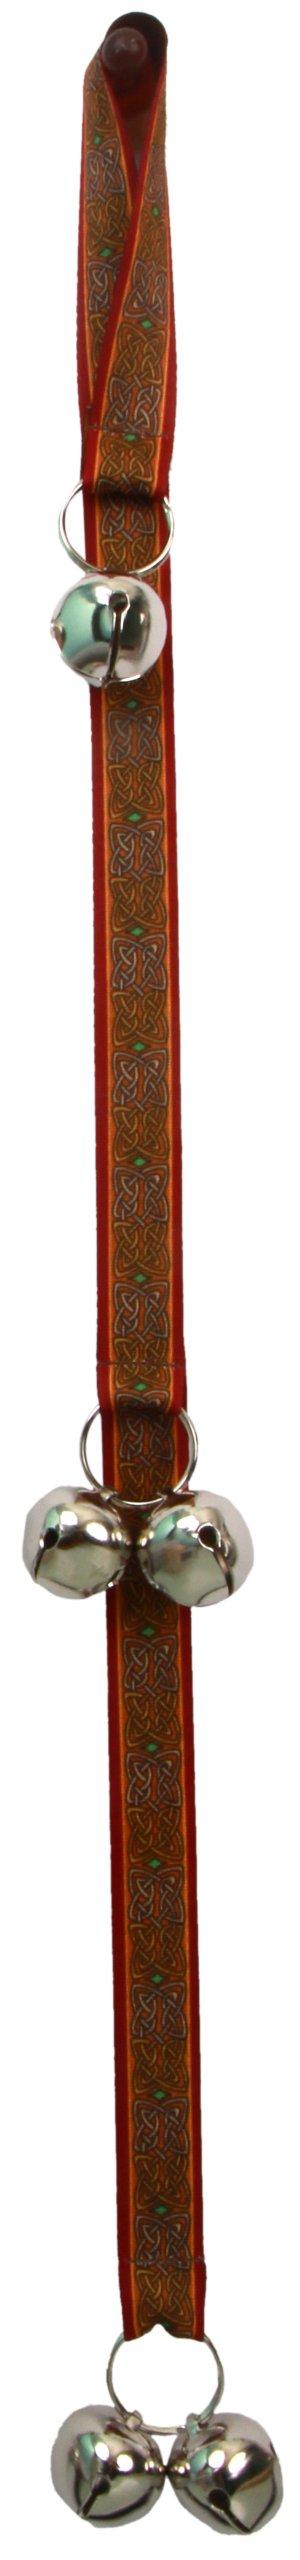 Yellow Dog Design Ding Dog Bell, Celtic